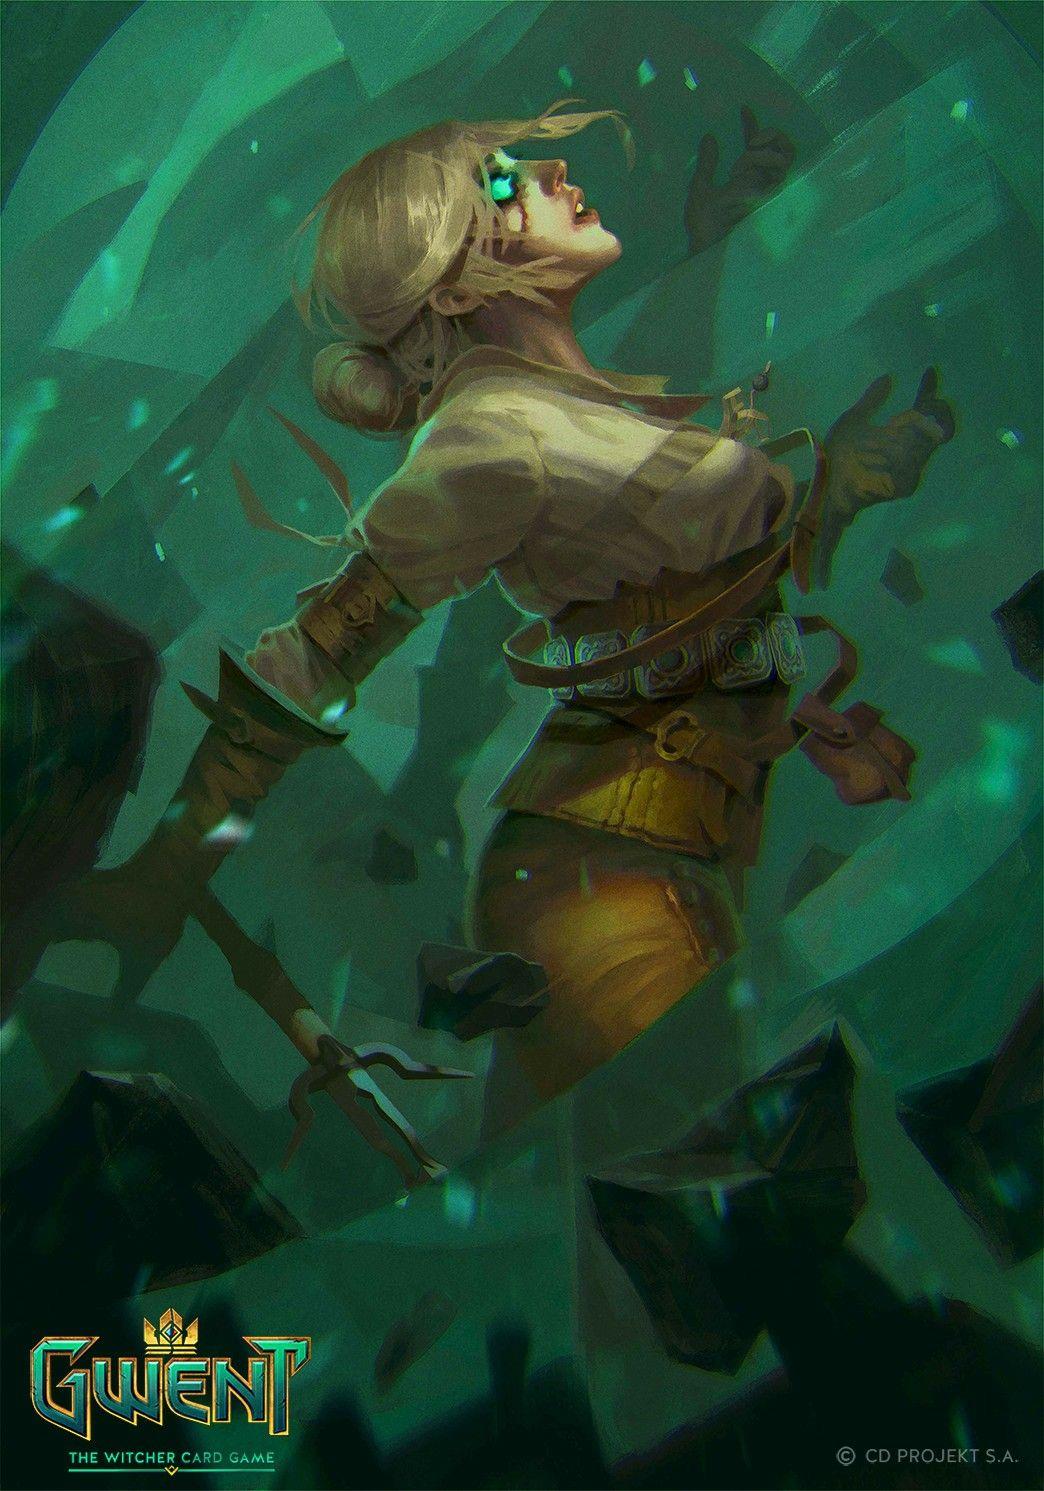 Ciri nova gwent card game gwent arte fantas a - Ciri gwent card witcher 3 ...